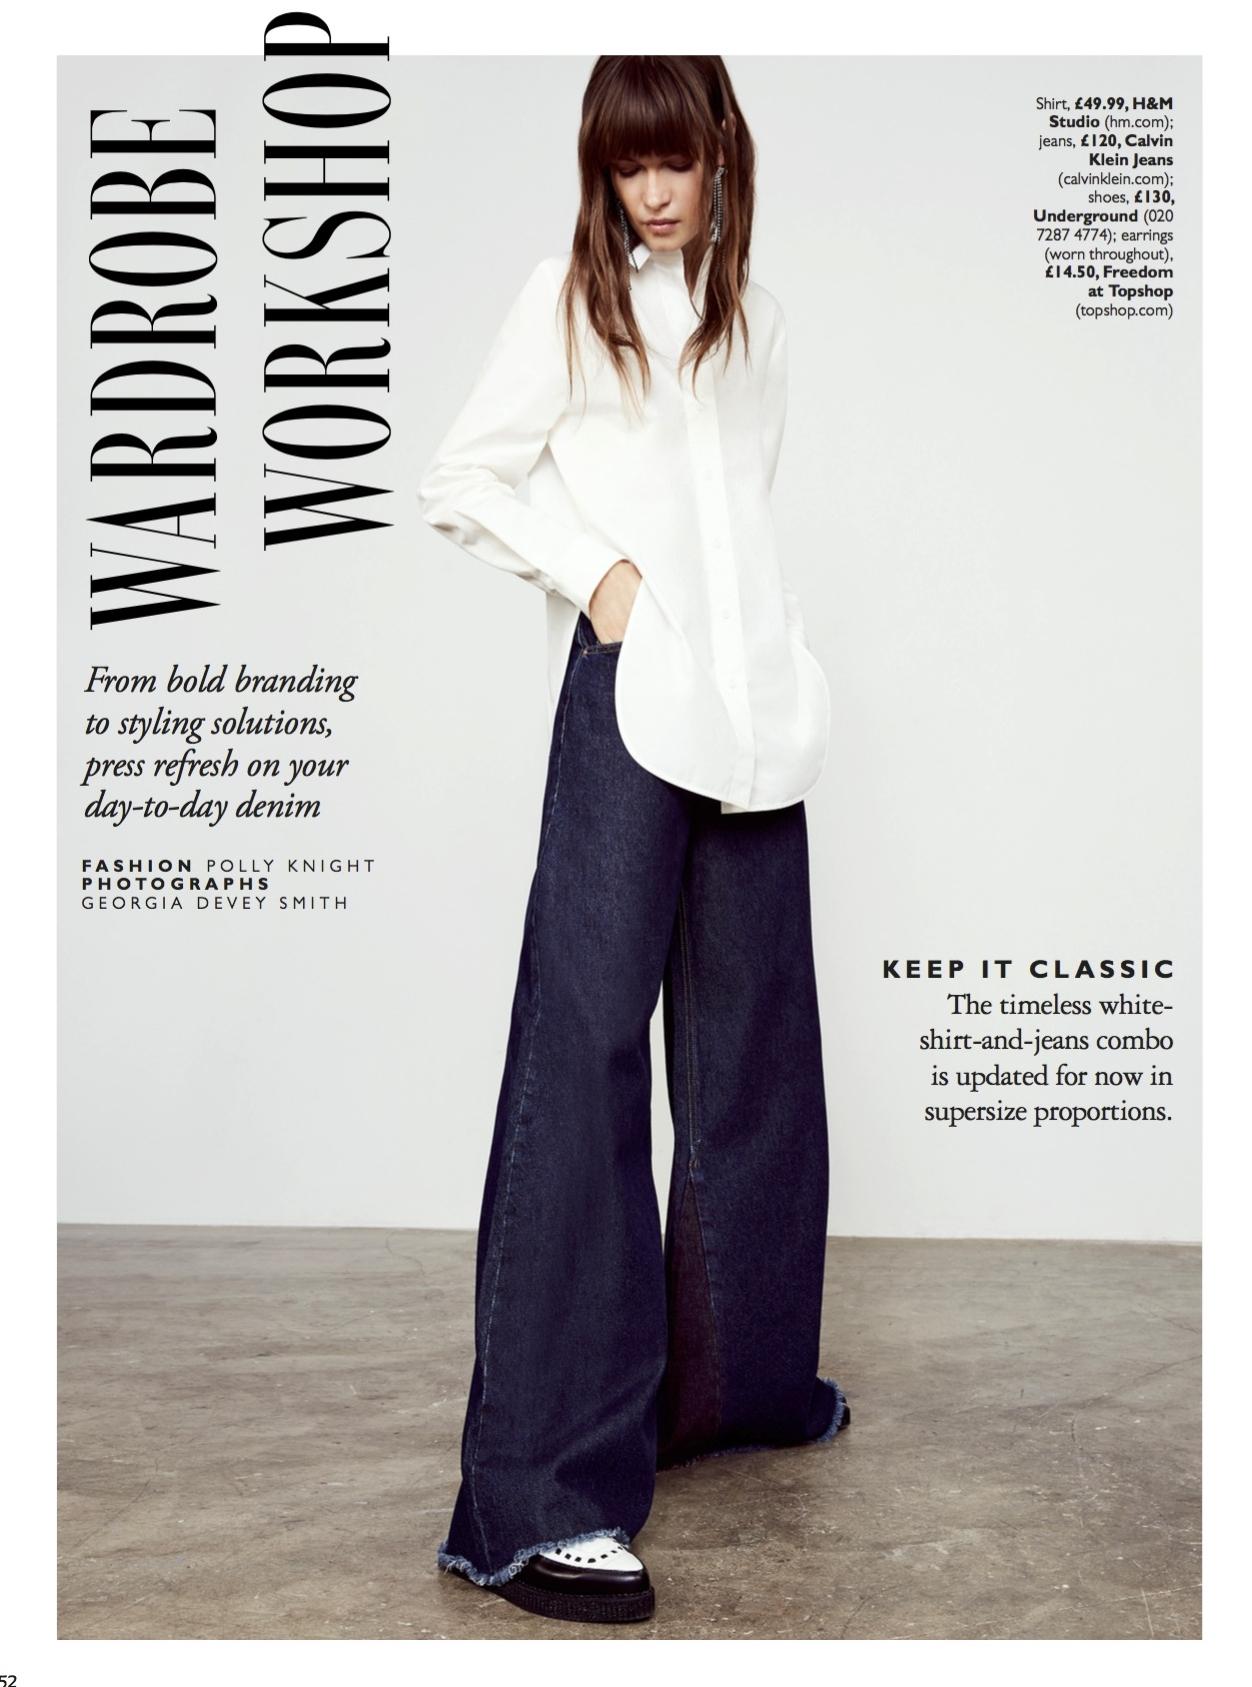 Fashion_ClosetConstruction Denim 6pp_pdf_1 copy.jpg